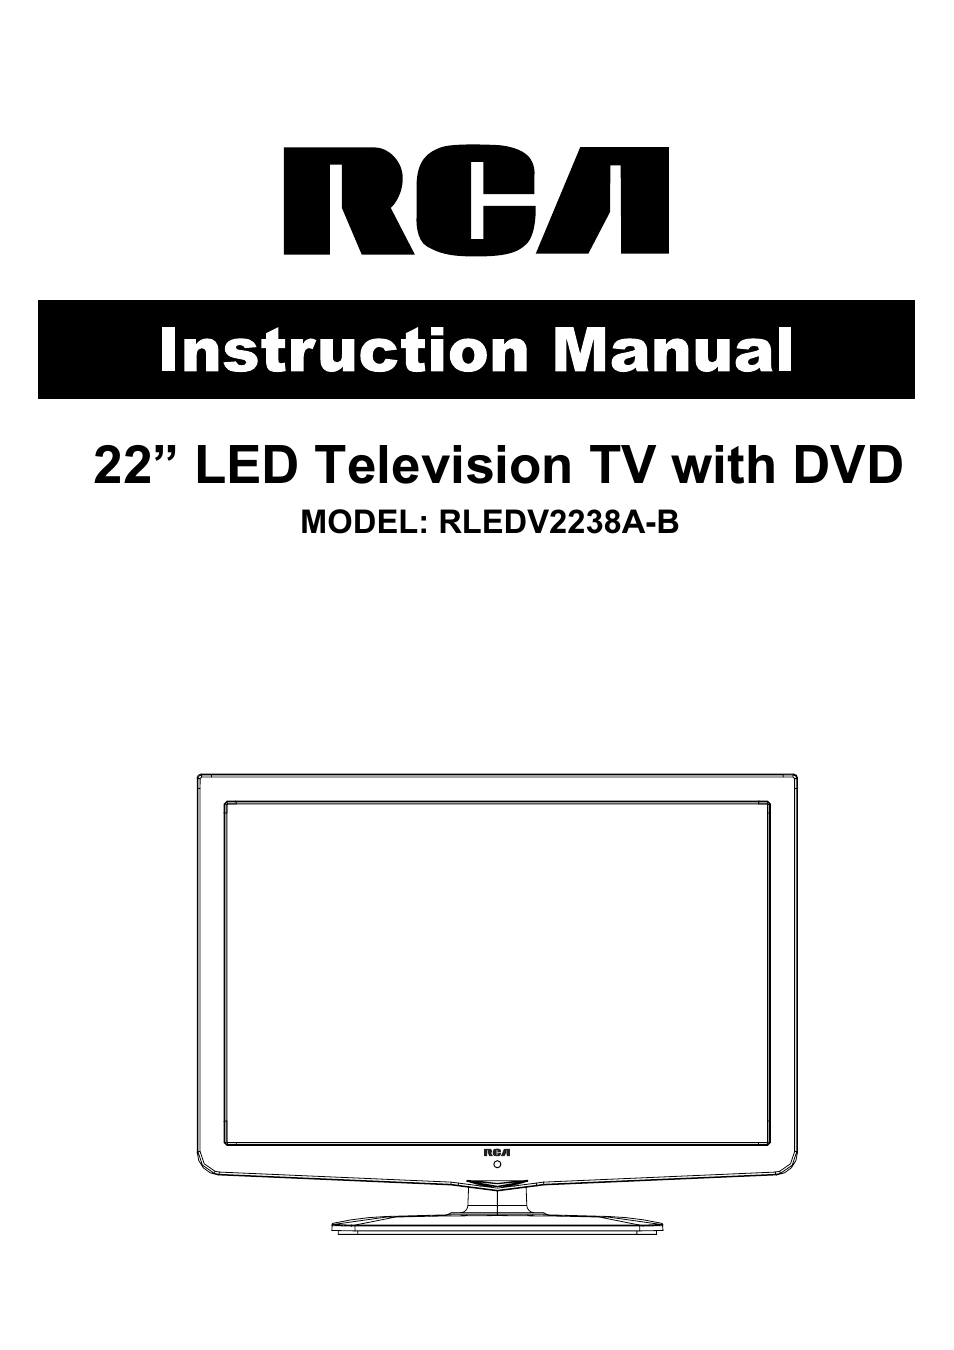 rca rledv2238a b user manual 31 pages. Black Bedroom Furniture Sets. Home Design Ideas